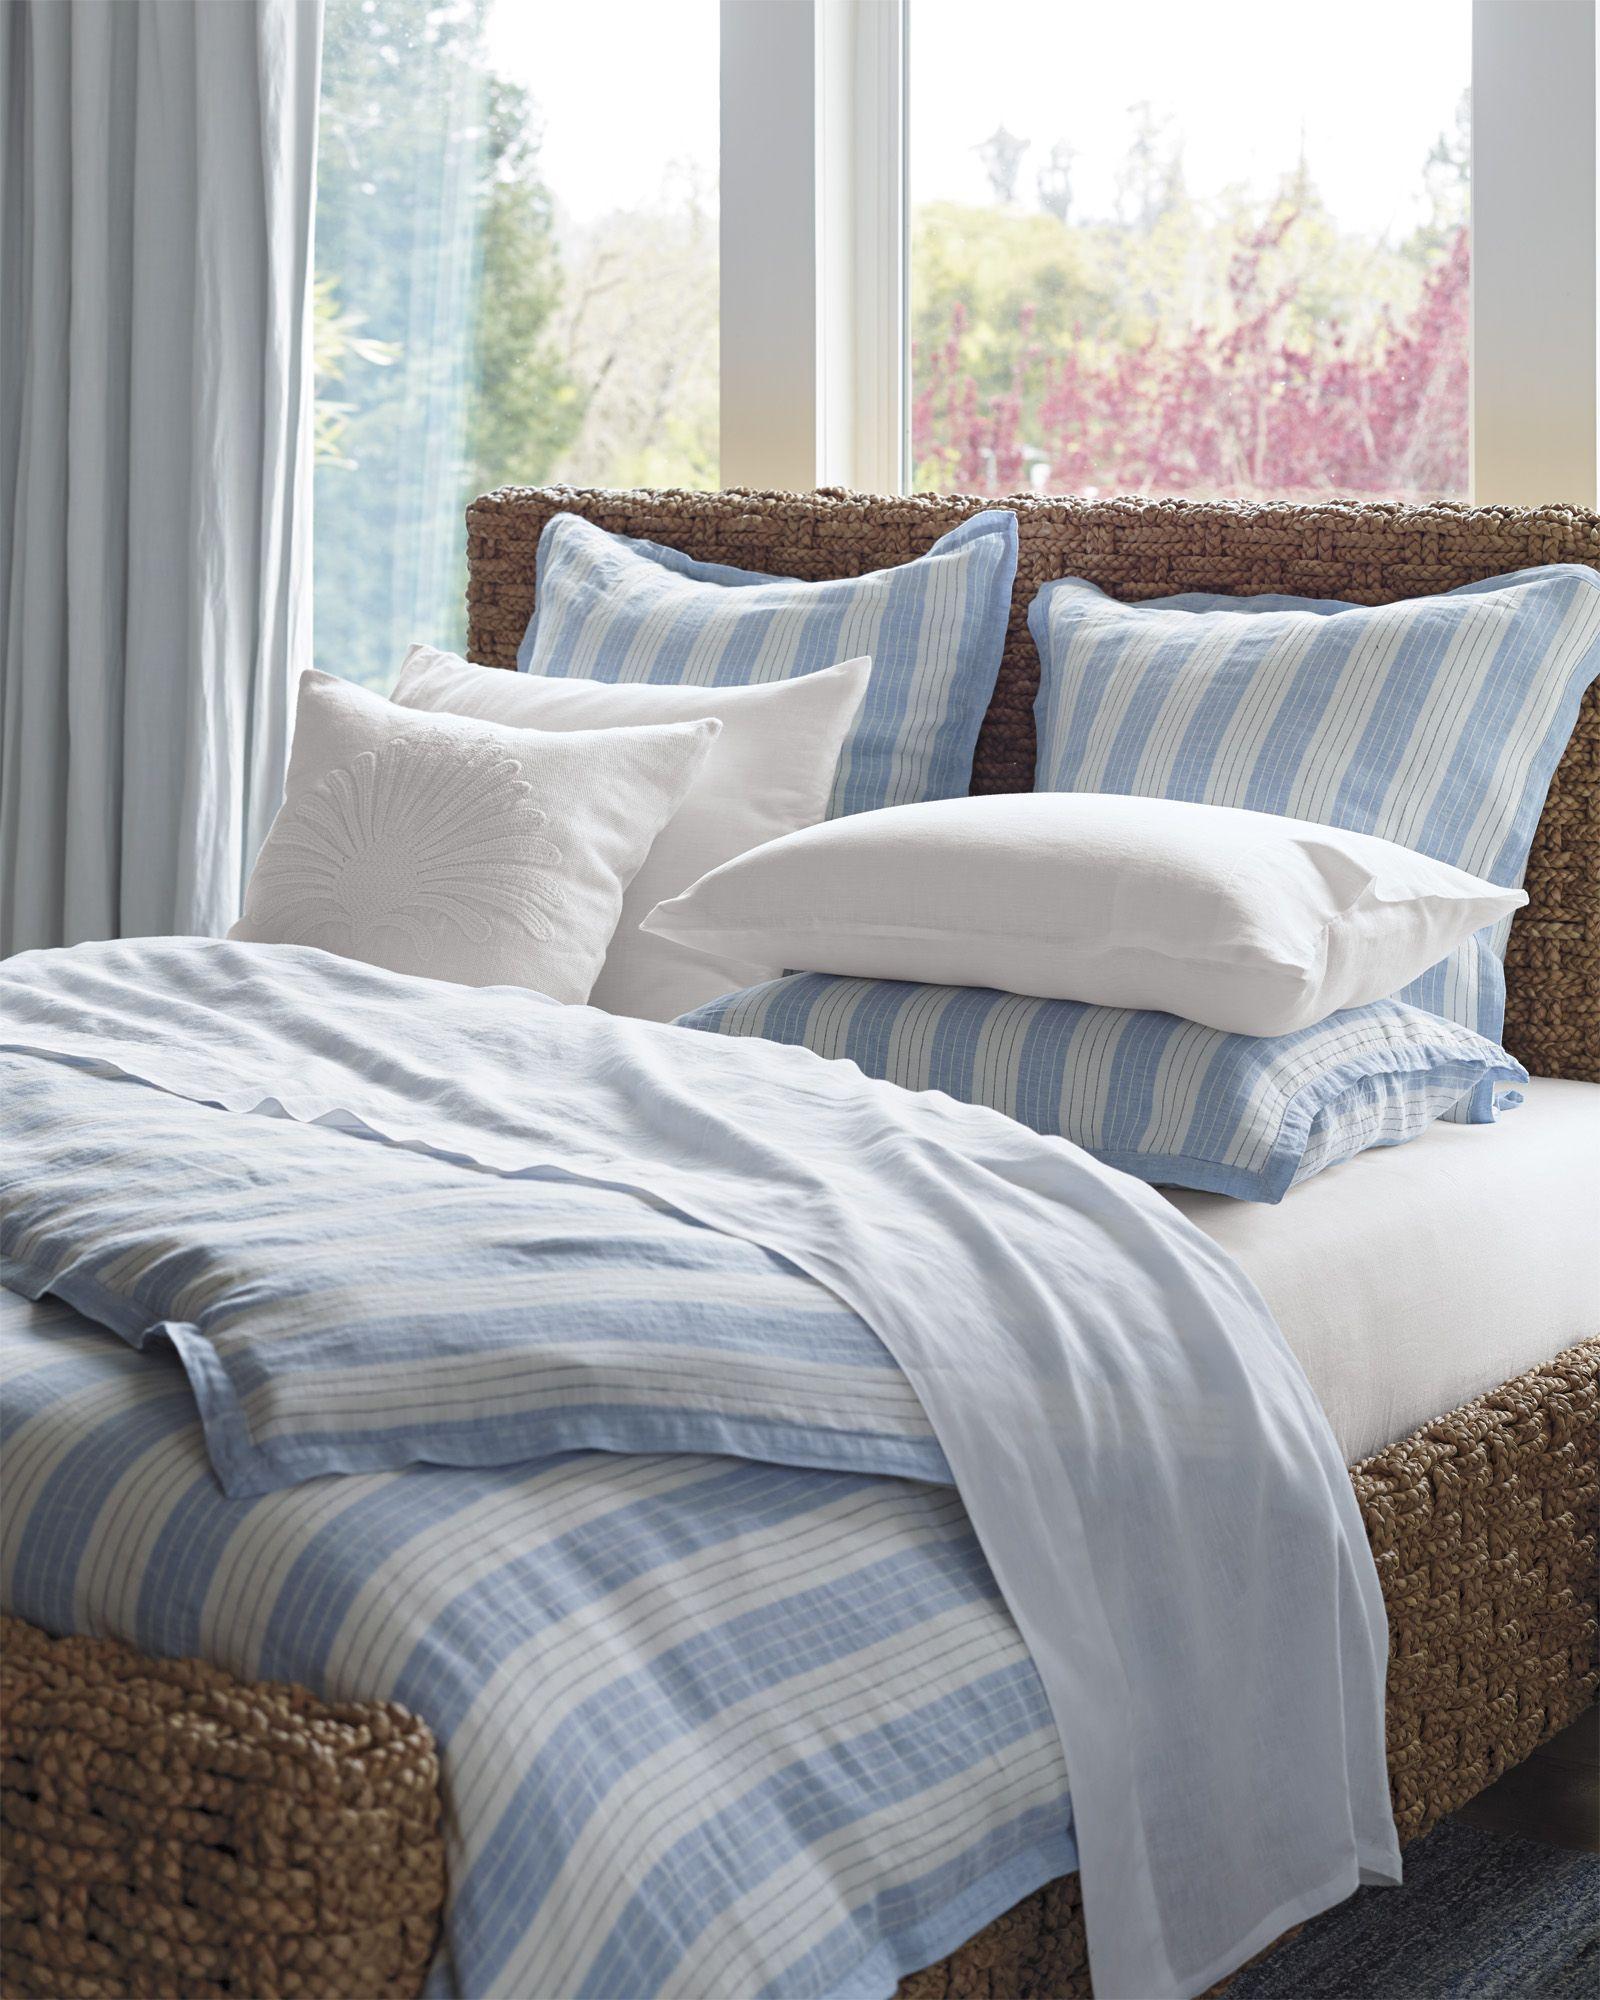 Porto Linen Duvet Cover Bed Linens Luxury Cool Beds Bed Linen